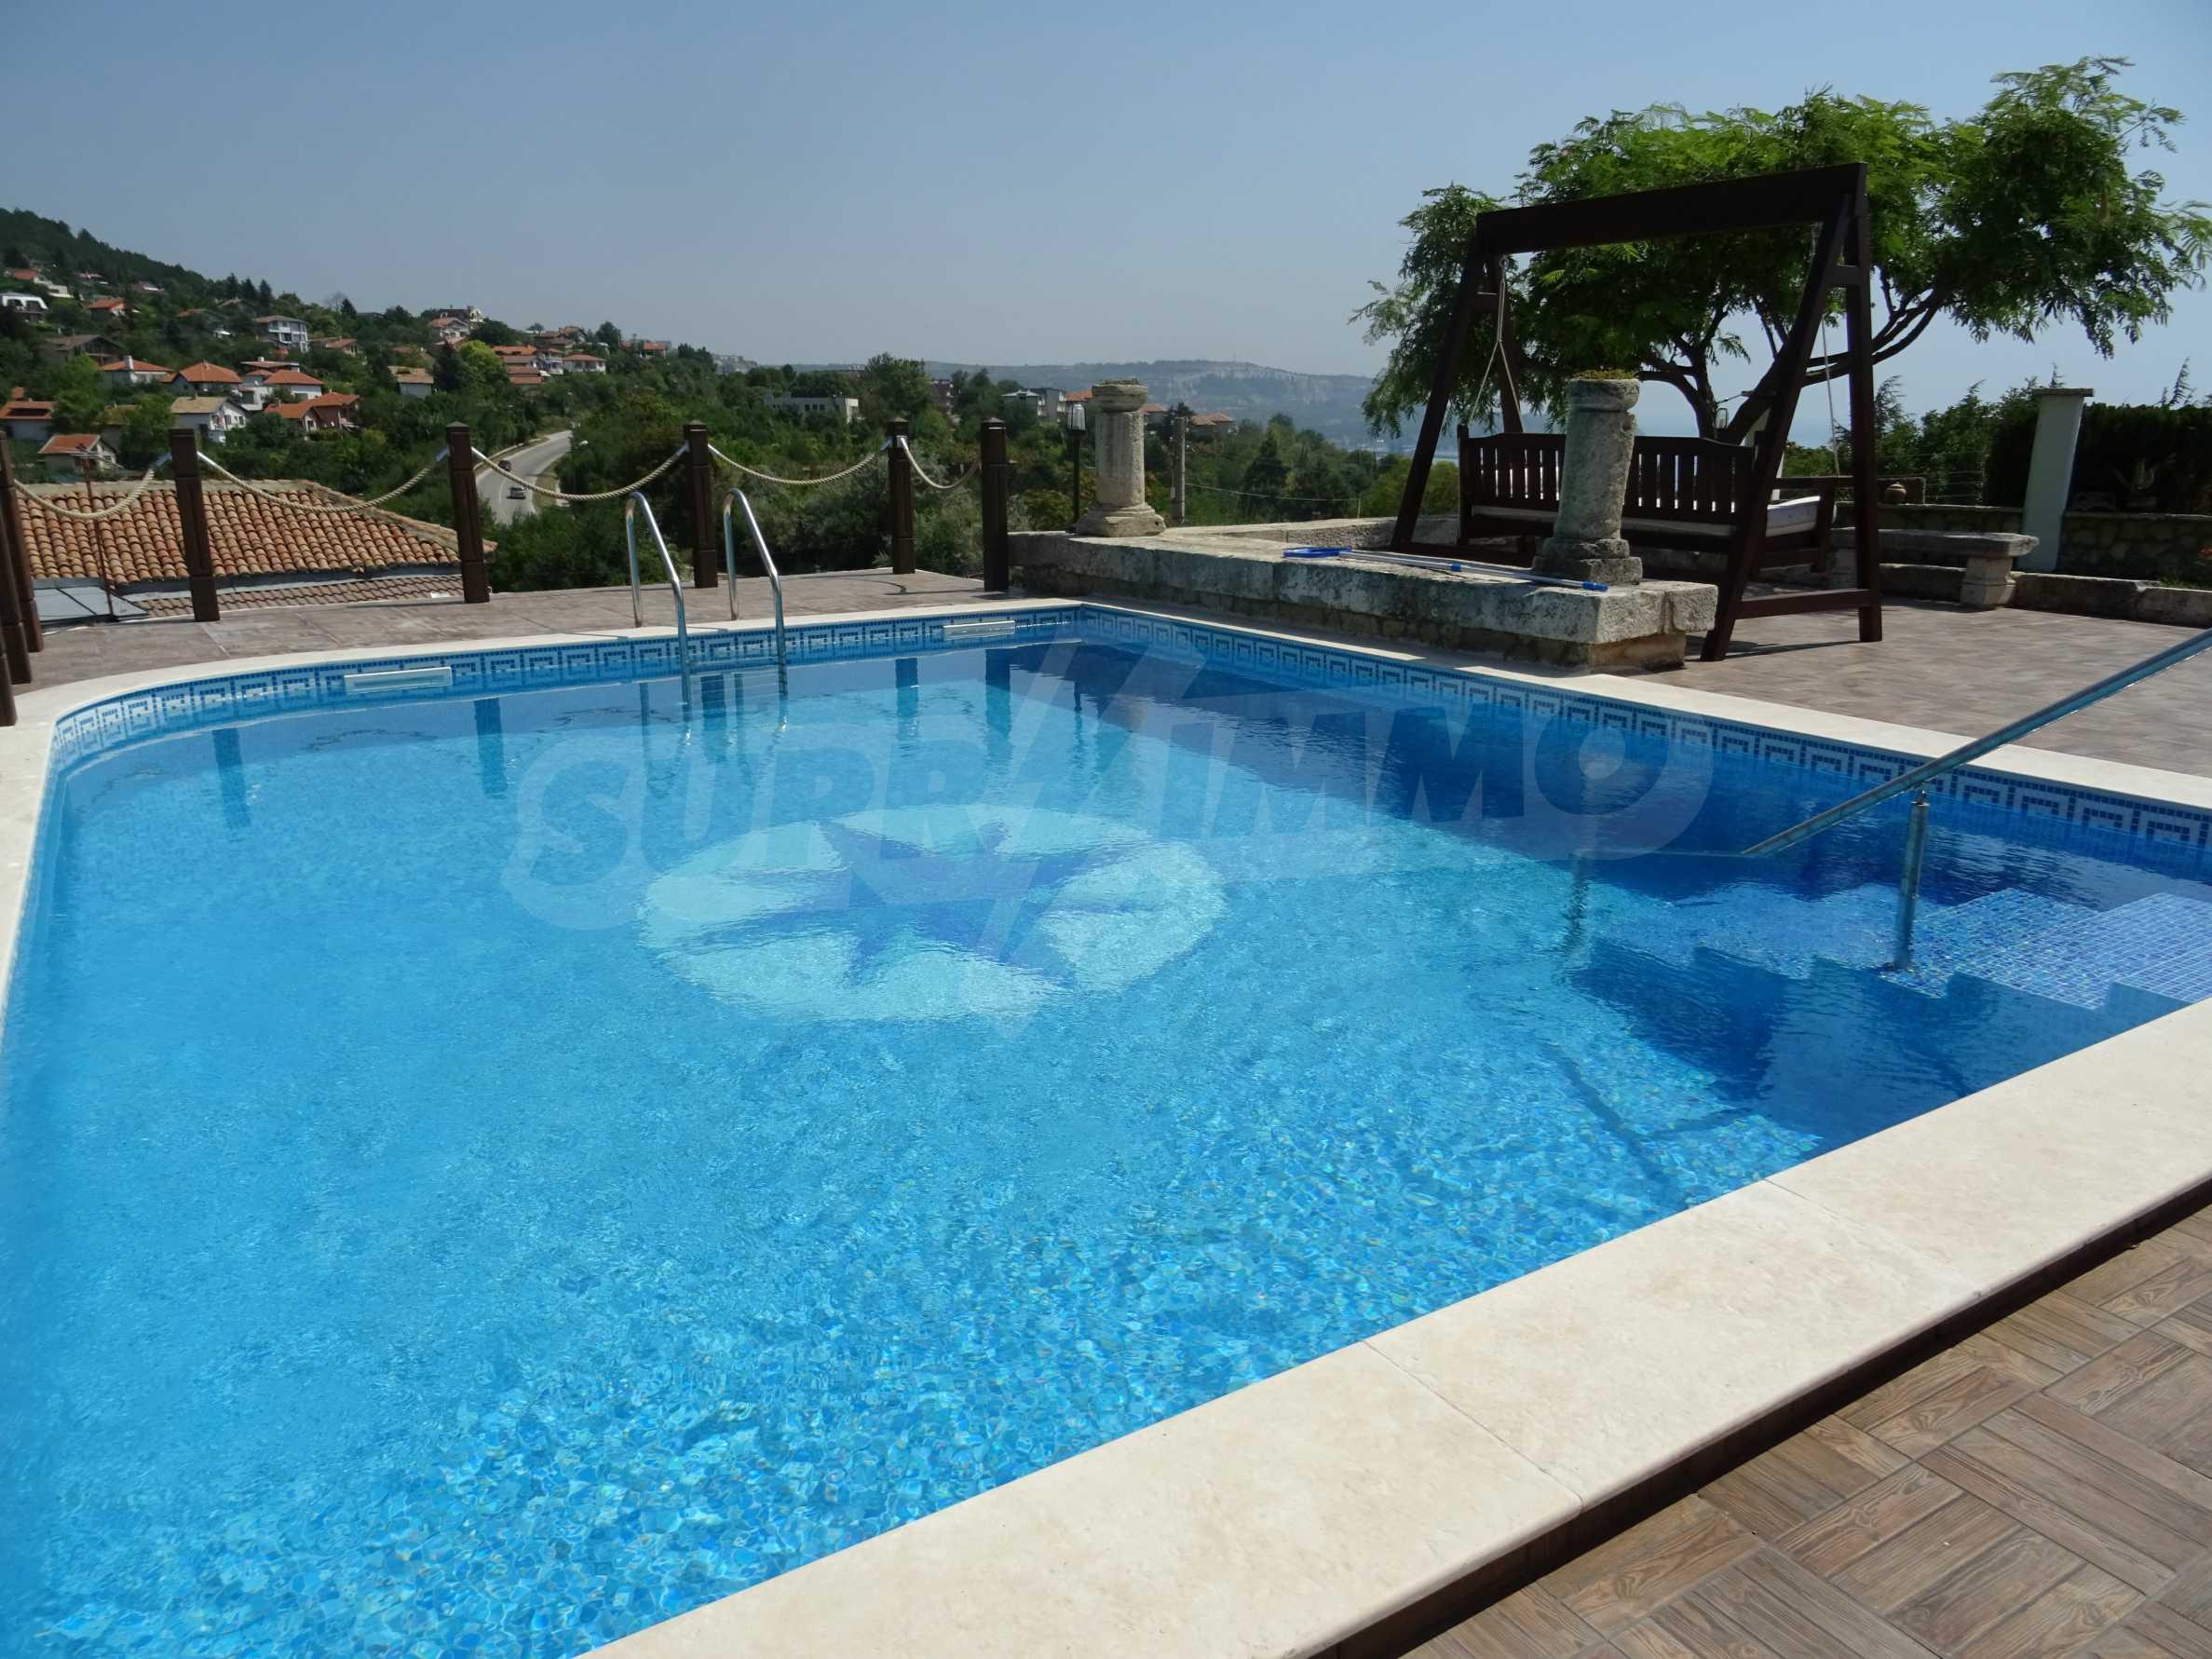 The Mediterranean style - a sense of luxury 1